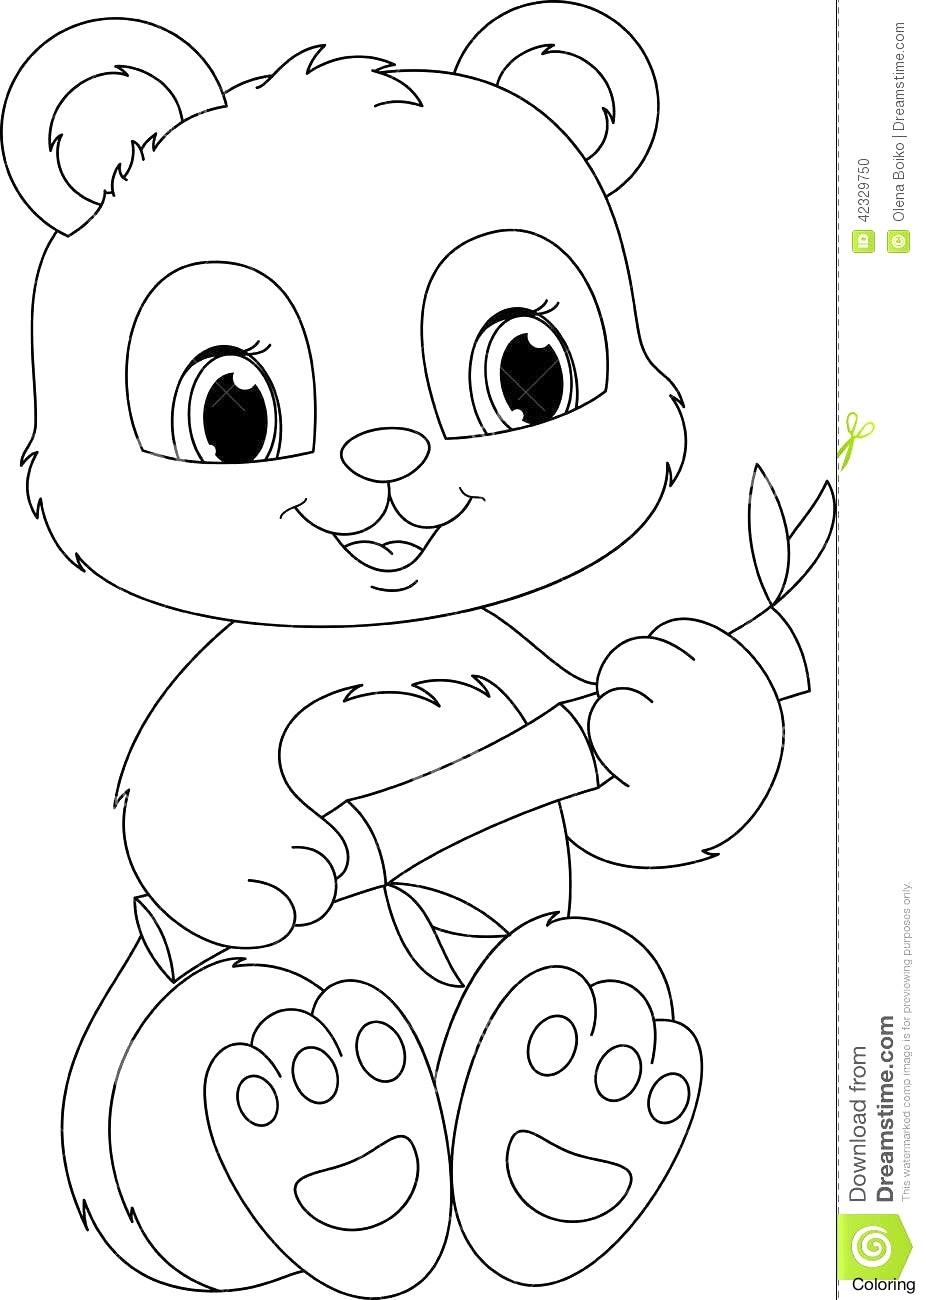 Panda Drawing Cute At Getdrawings Com Free For Personal Use Panda